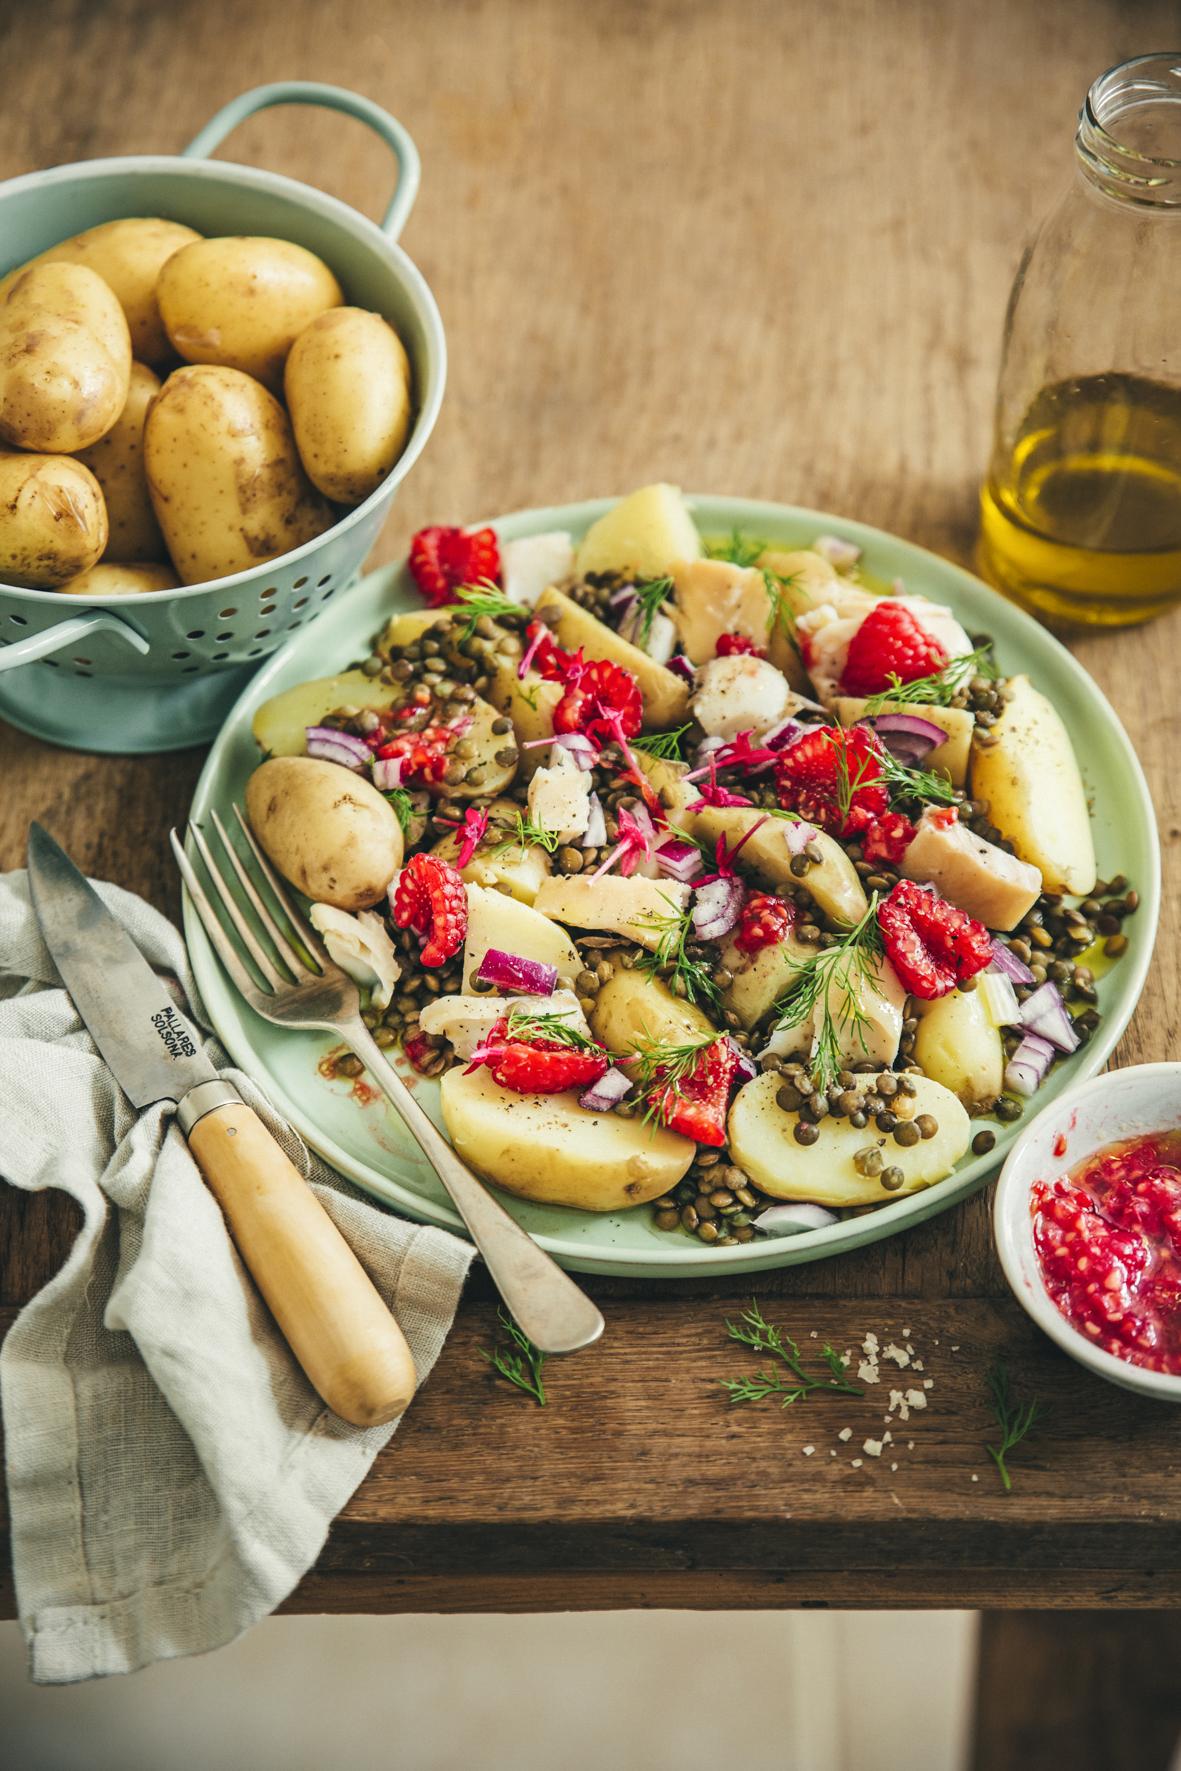 Salade tiède de pommes de terre de primeur au haddock ©Sandrine Saadi